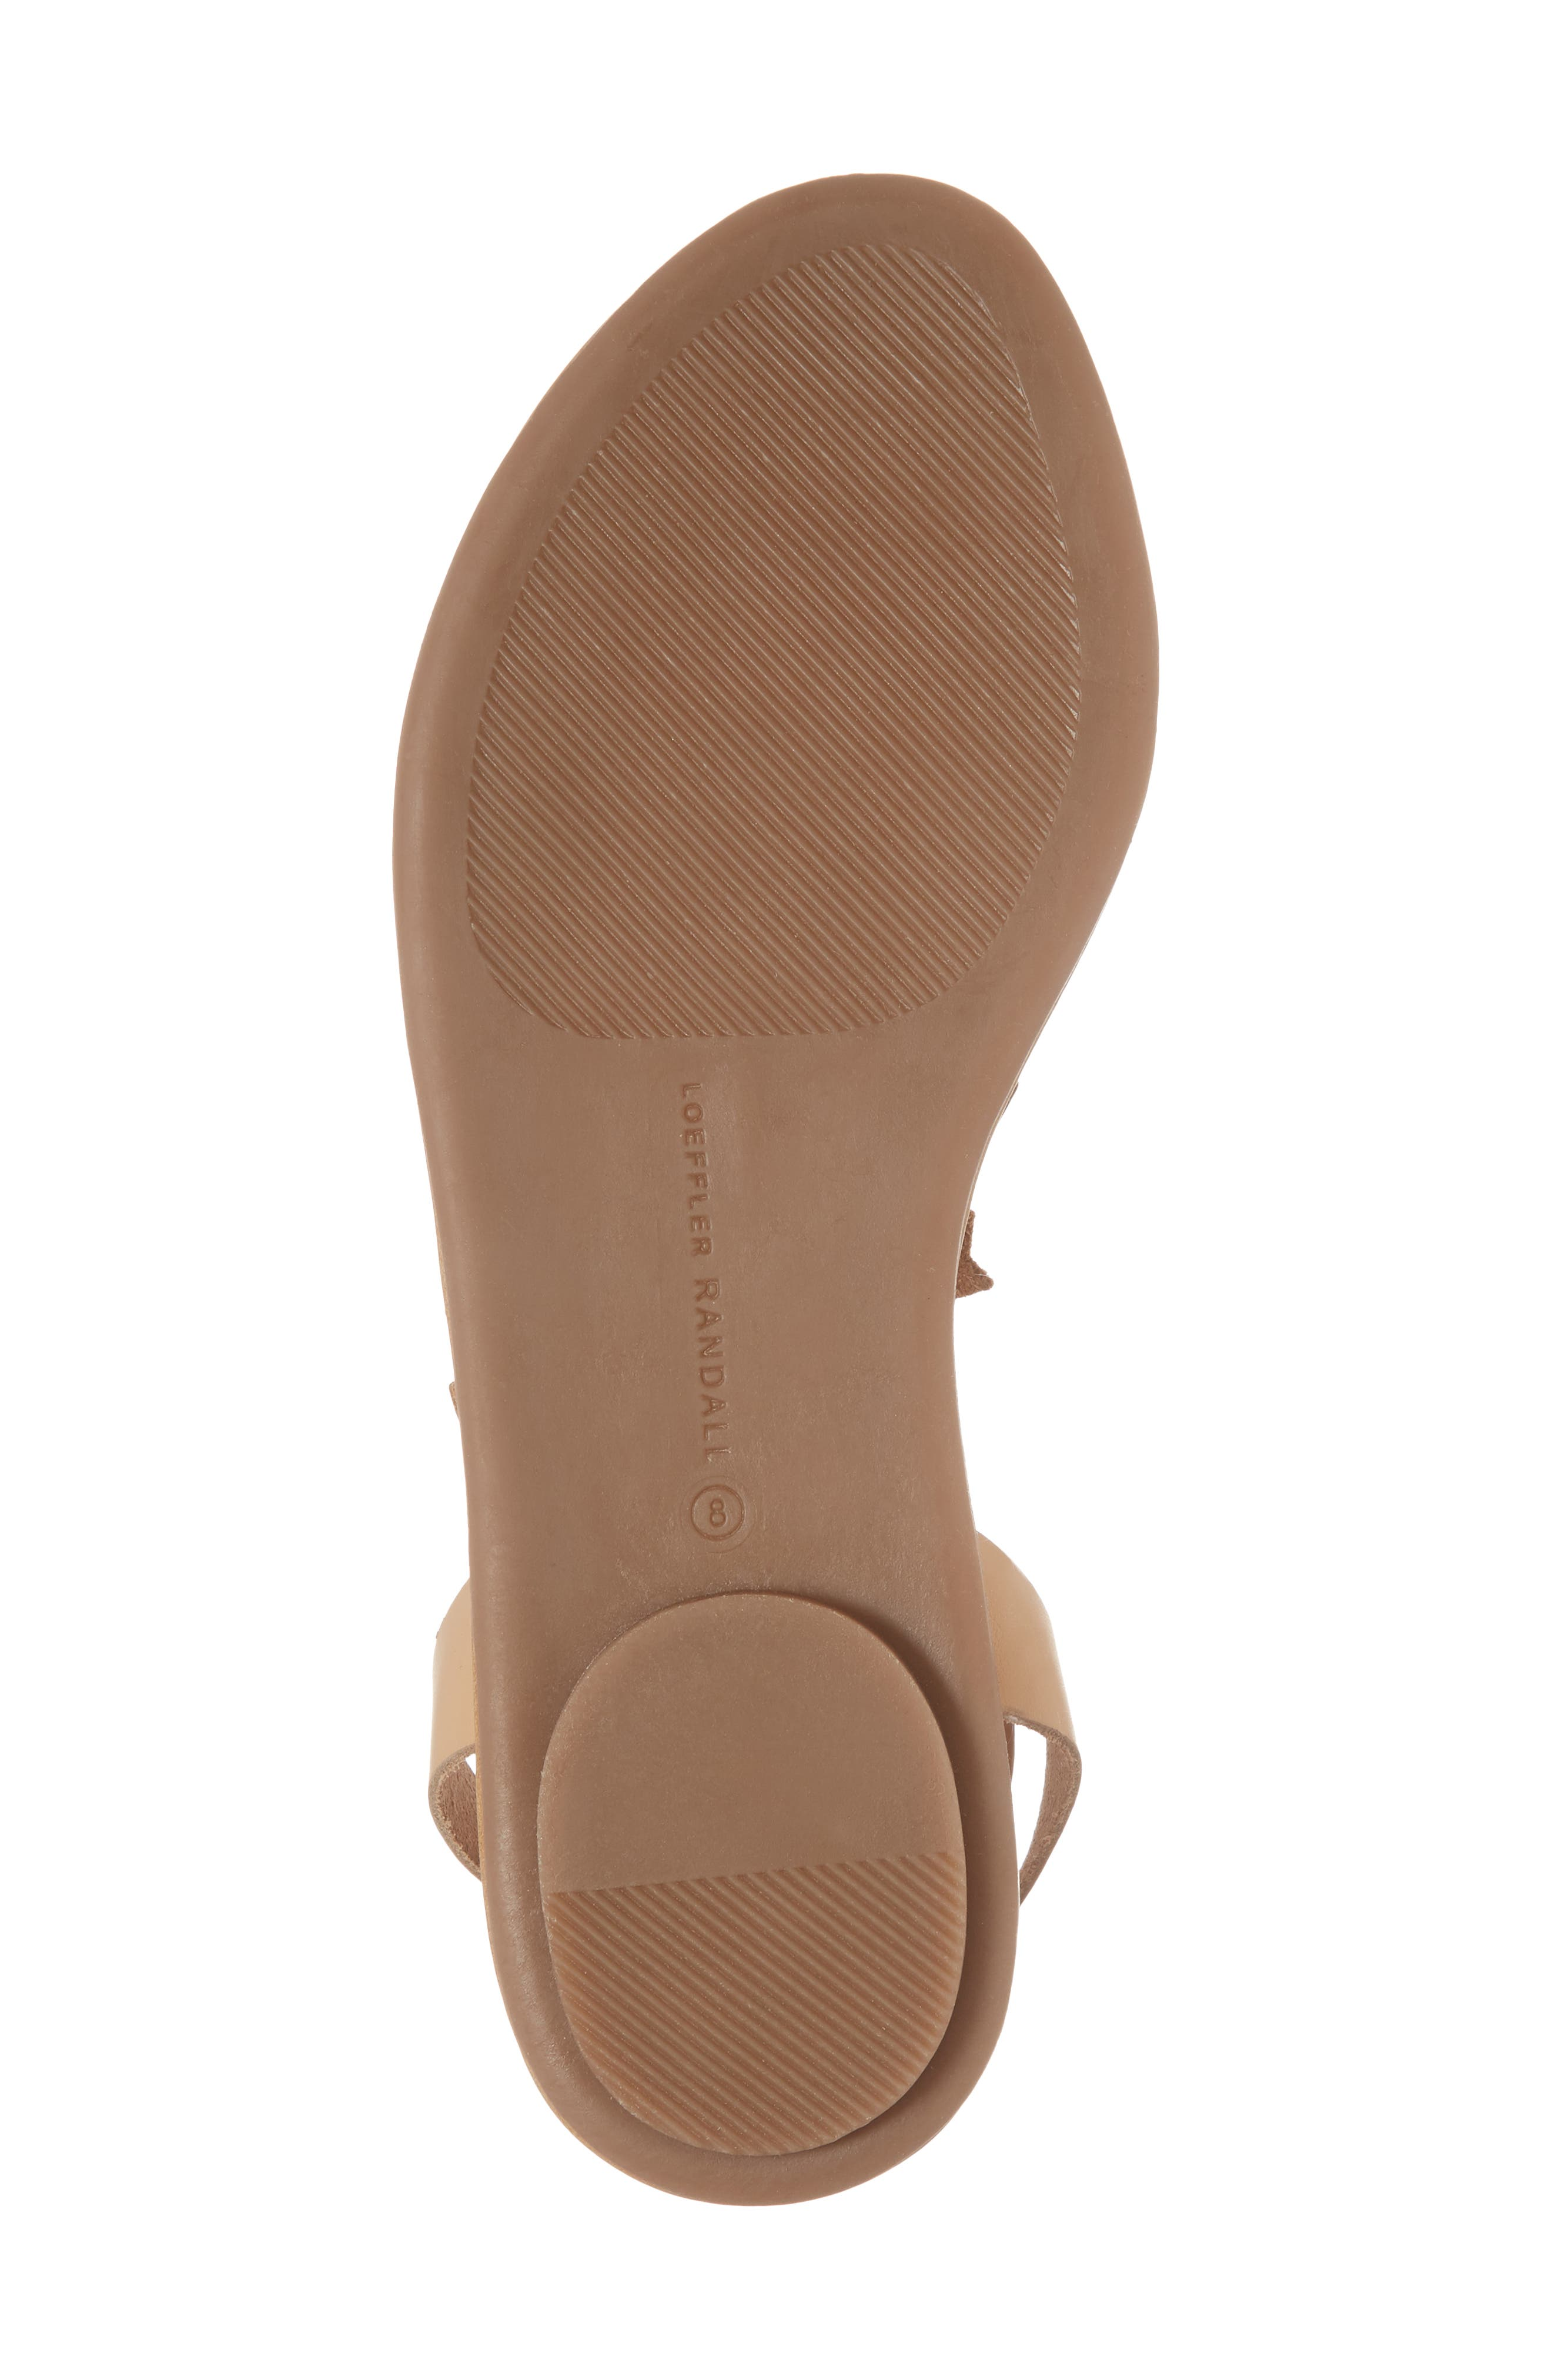 Starla Ankle Wrap Sandal,                             Alternate thumbnail 6, color,                             Wheat